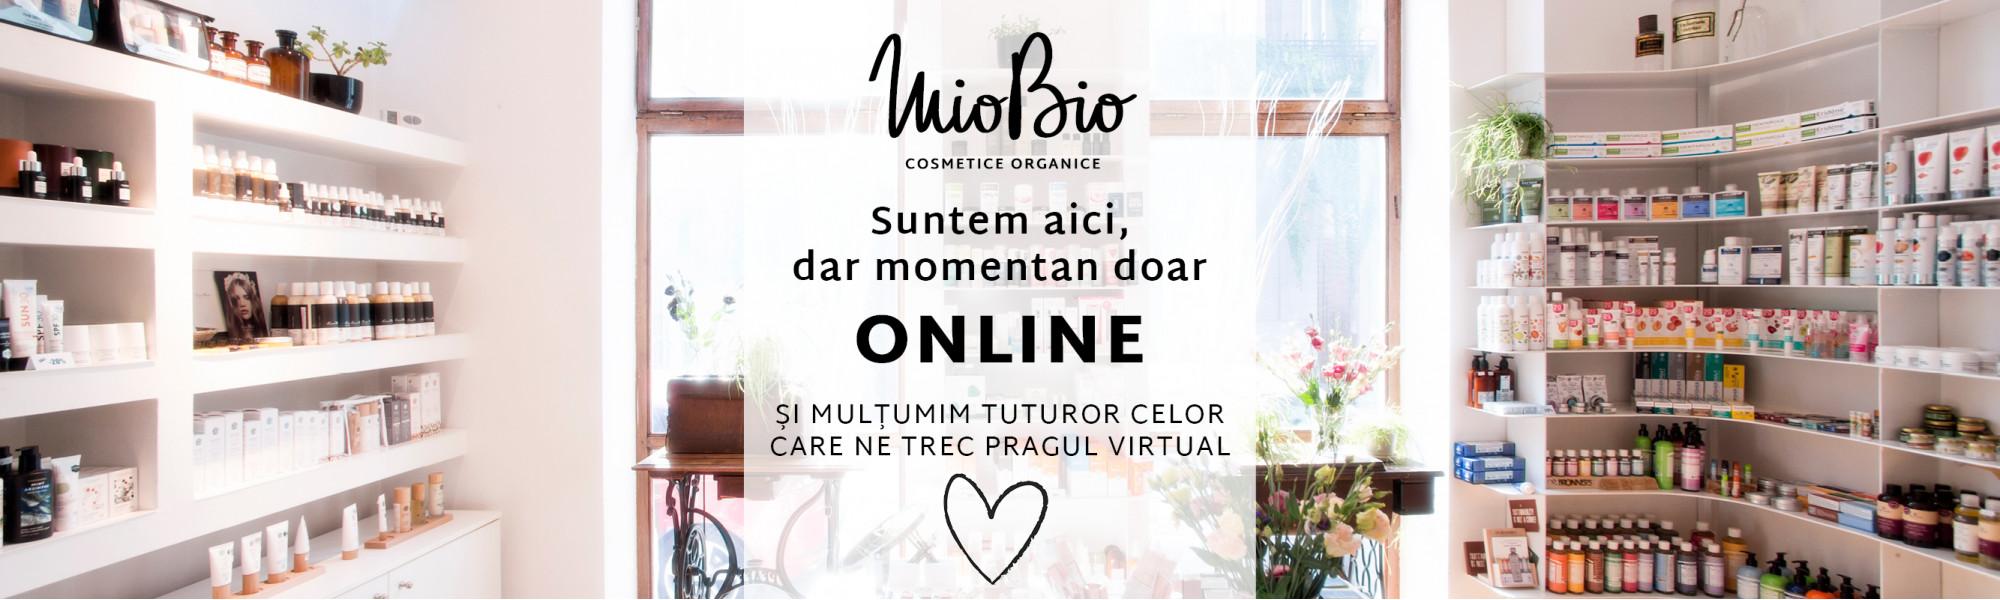 MioBio doar online